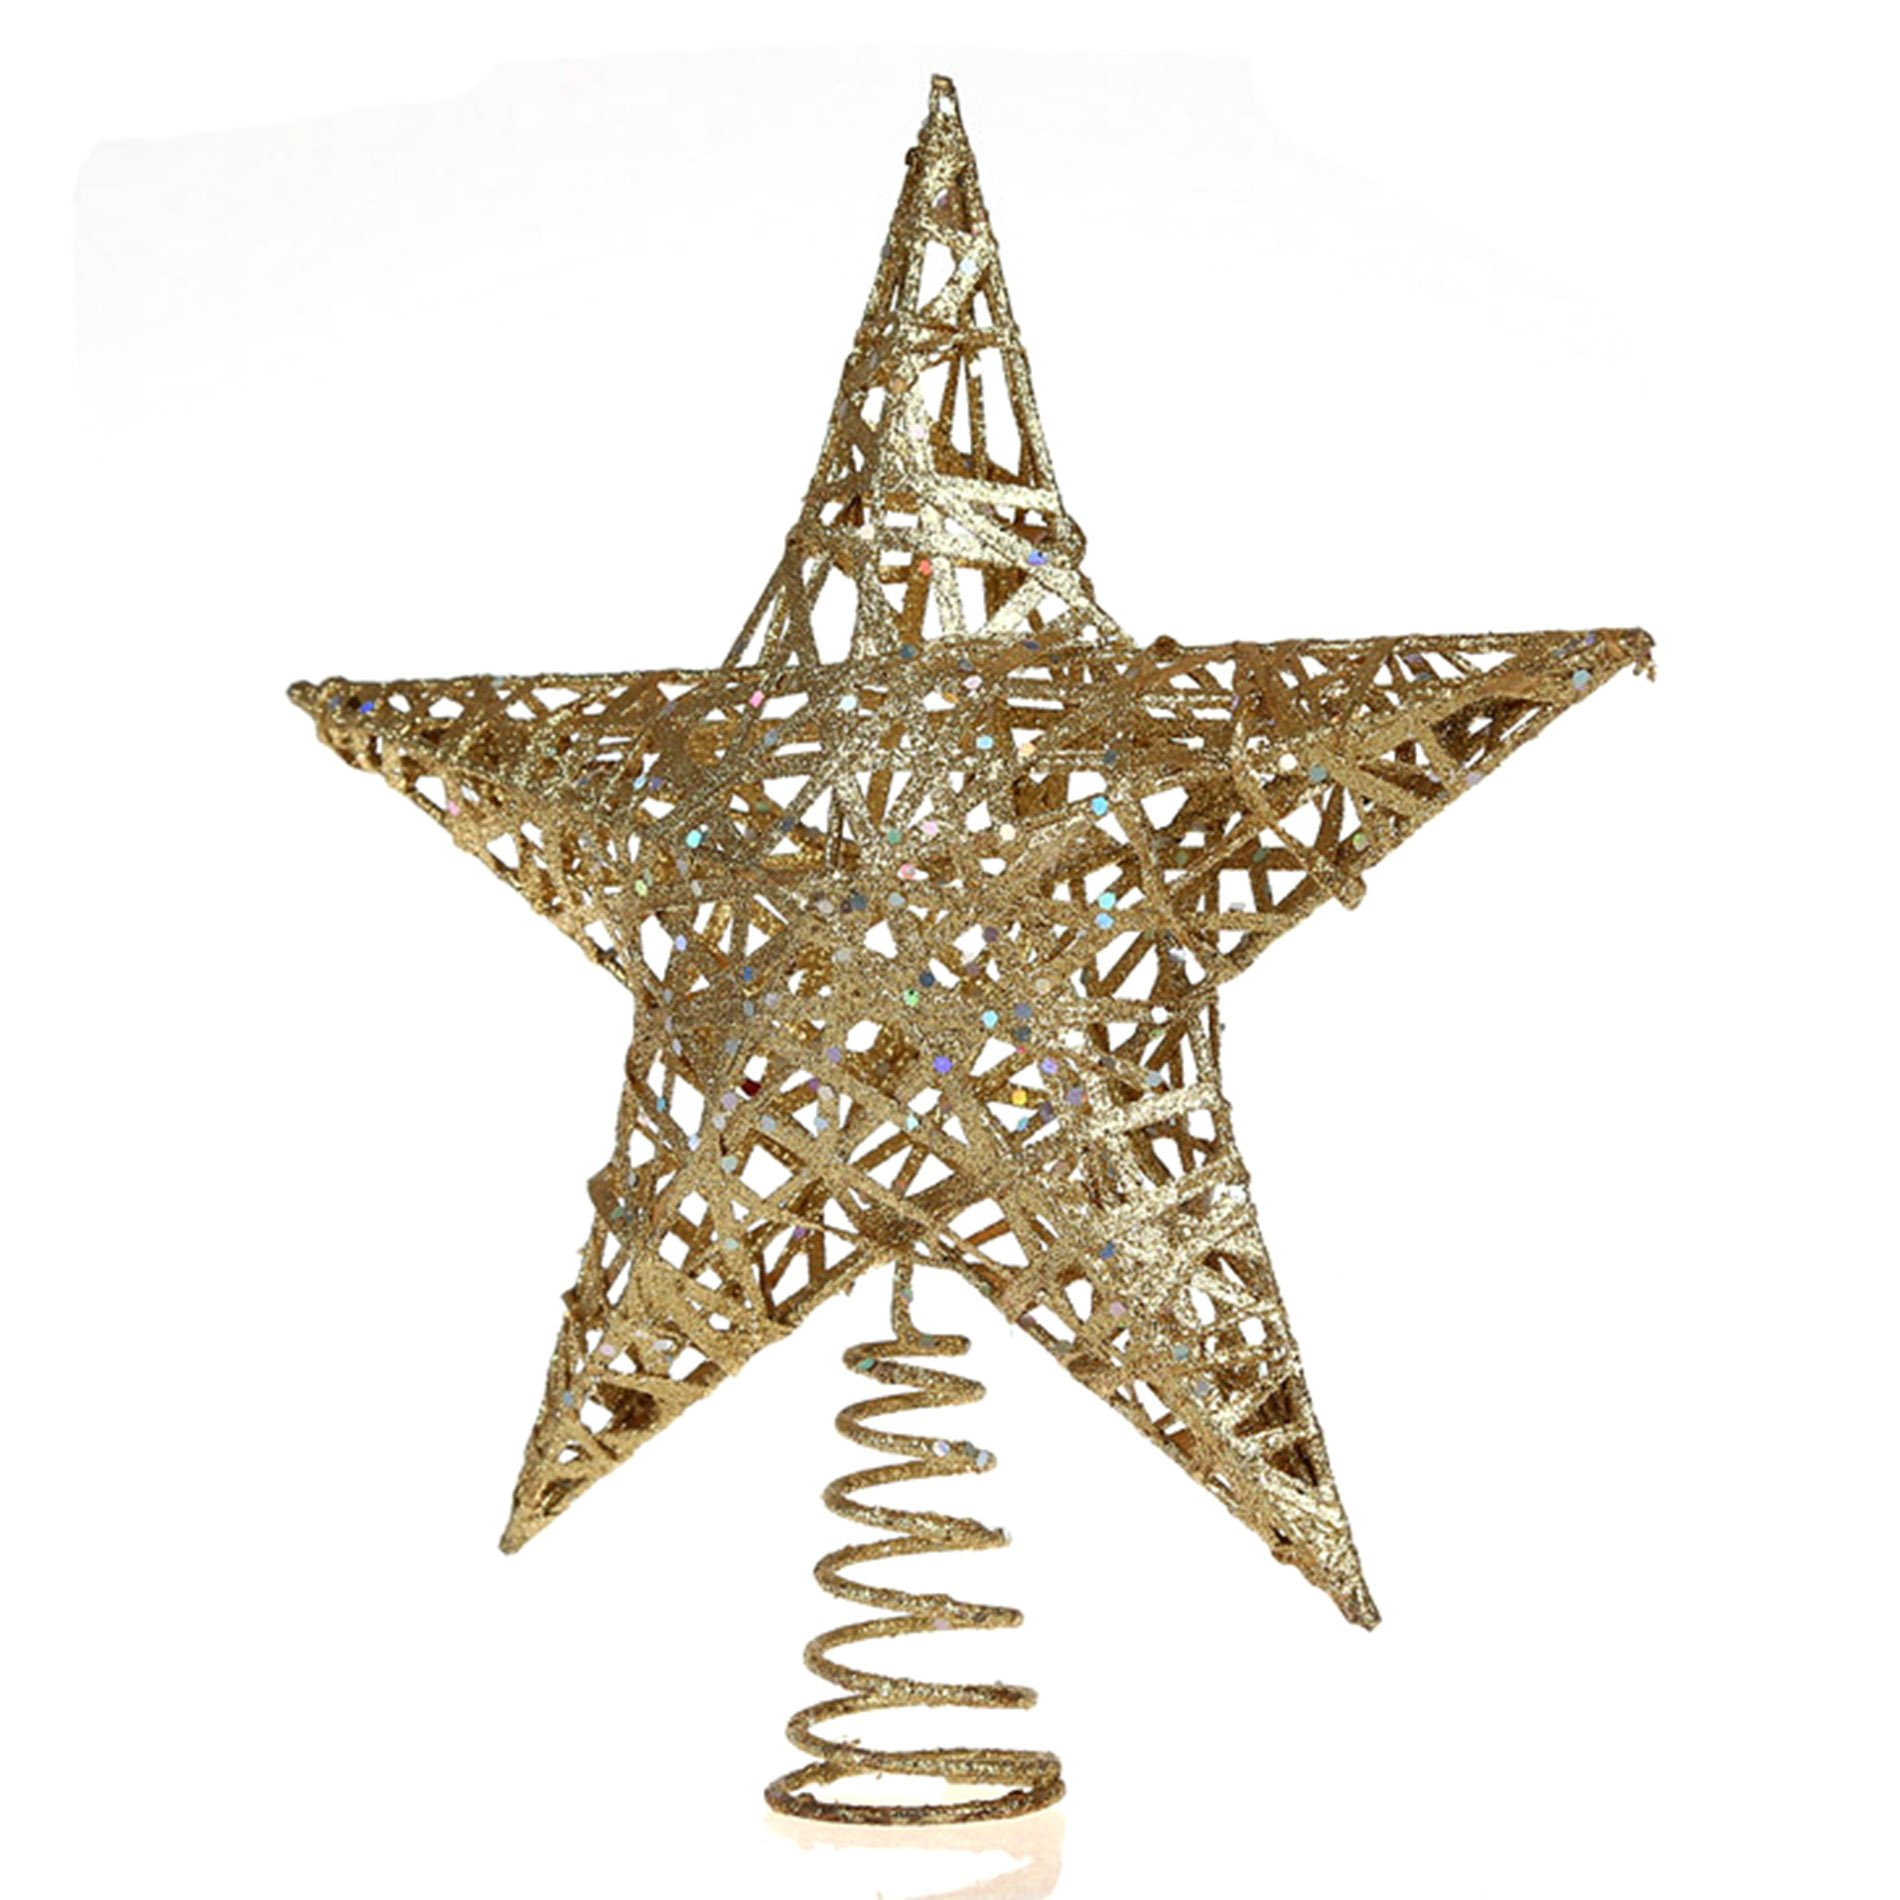 IDS Home 11.8-Inch (30cm) Elegant Gold Glitter Sparkle Swirl Christmas Tree Topper Star Ornaments Decoration